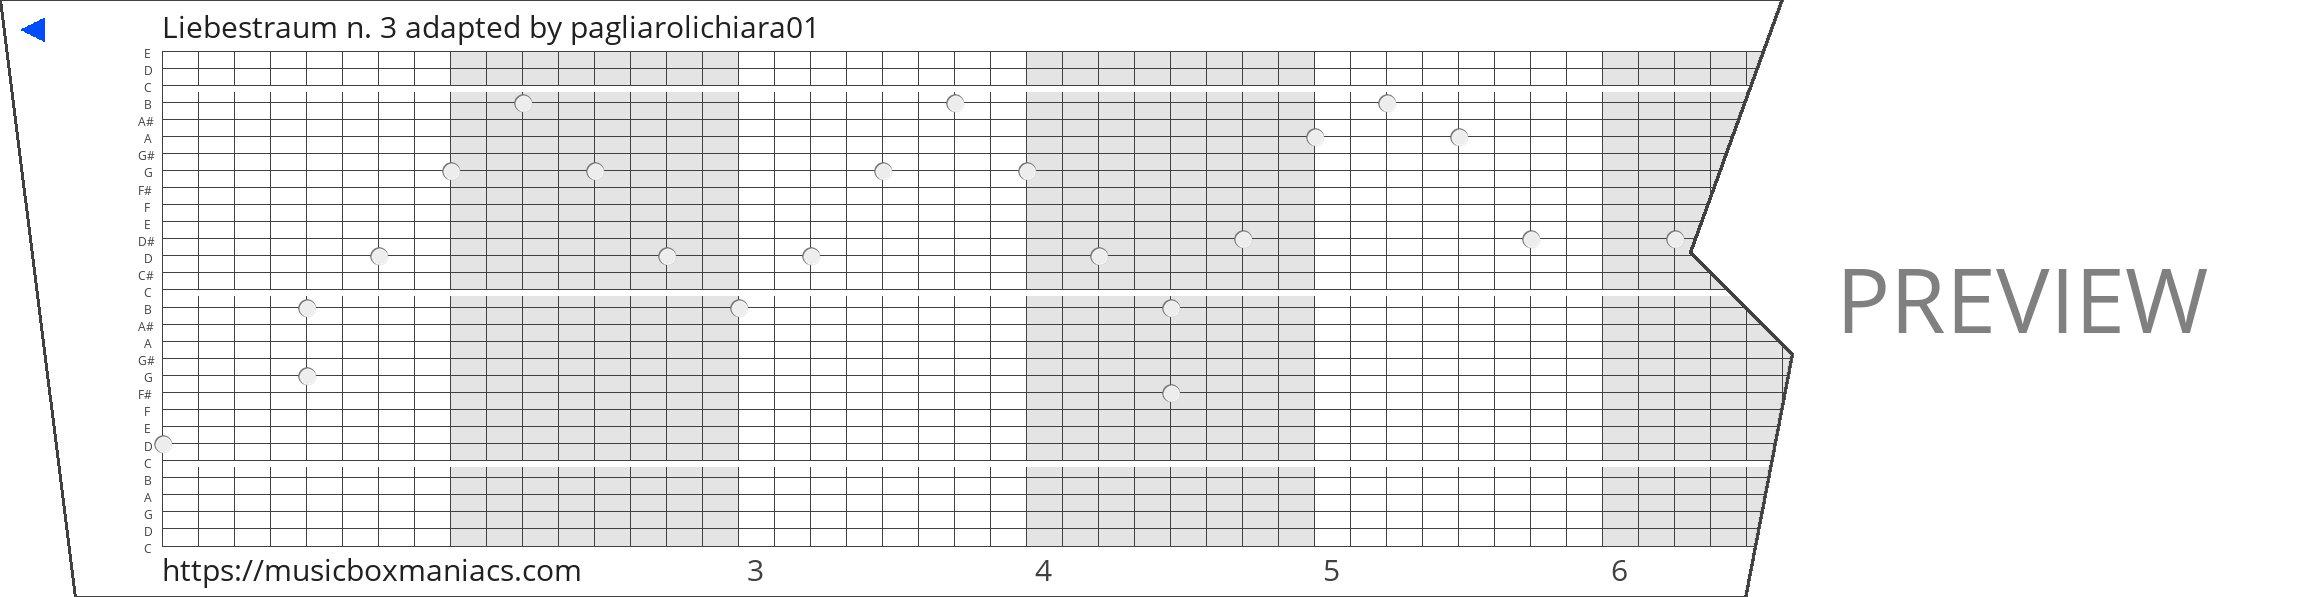 Liebestraum n. 3 adapted 30 note music box paper strip